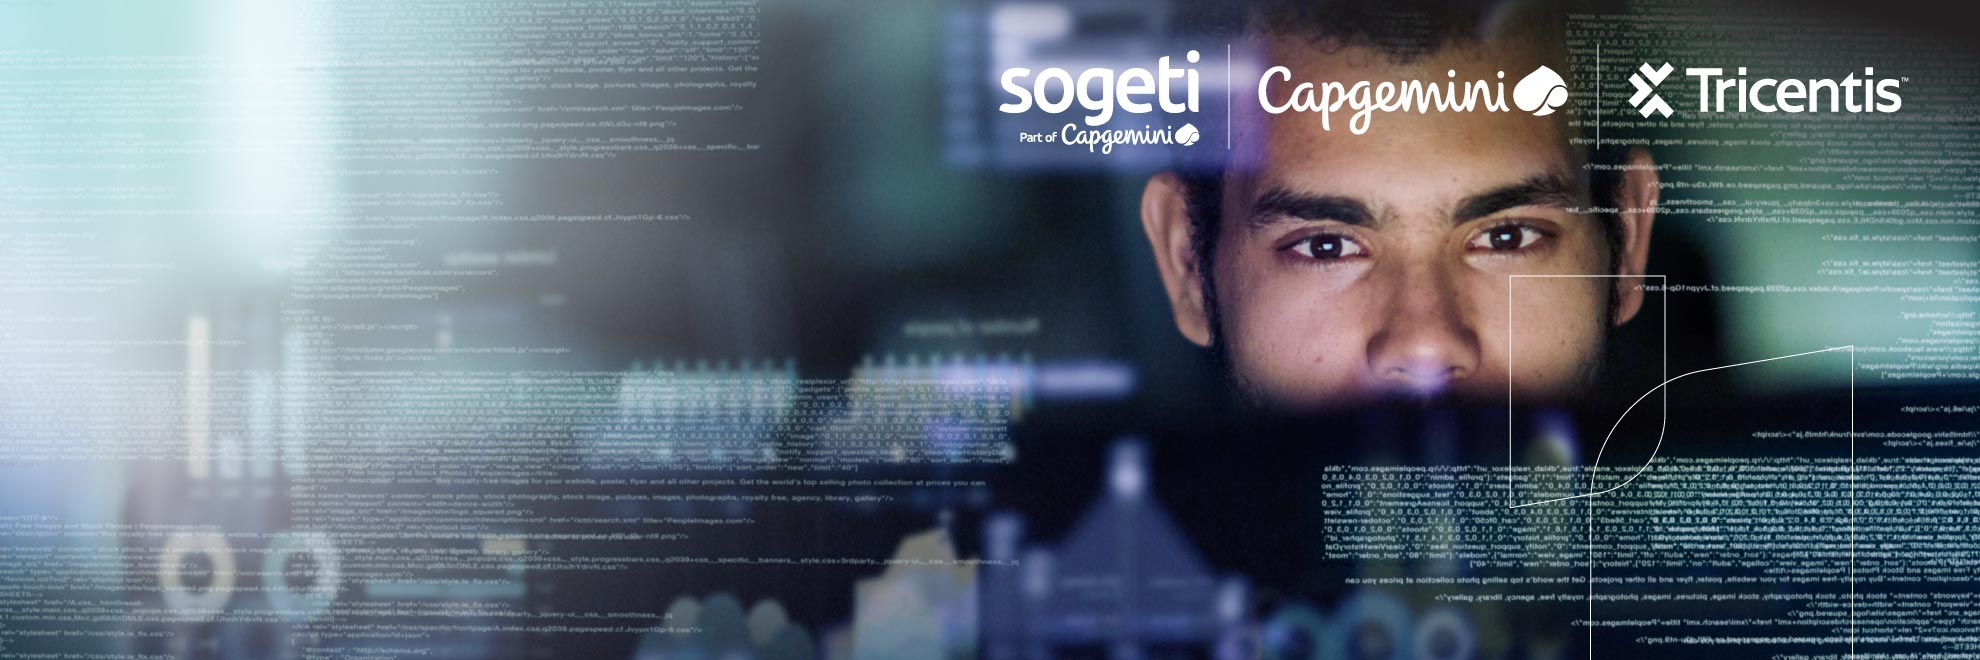 https://www.capgemini.com/gb-en/careers/learning-development/